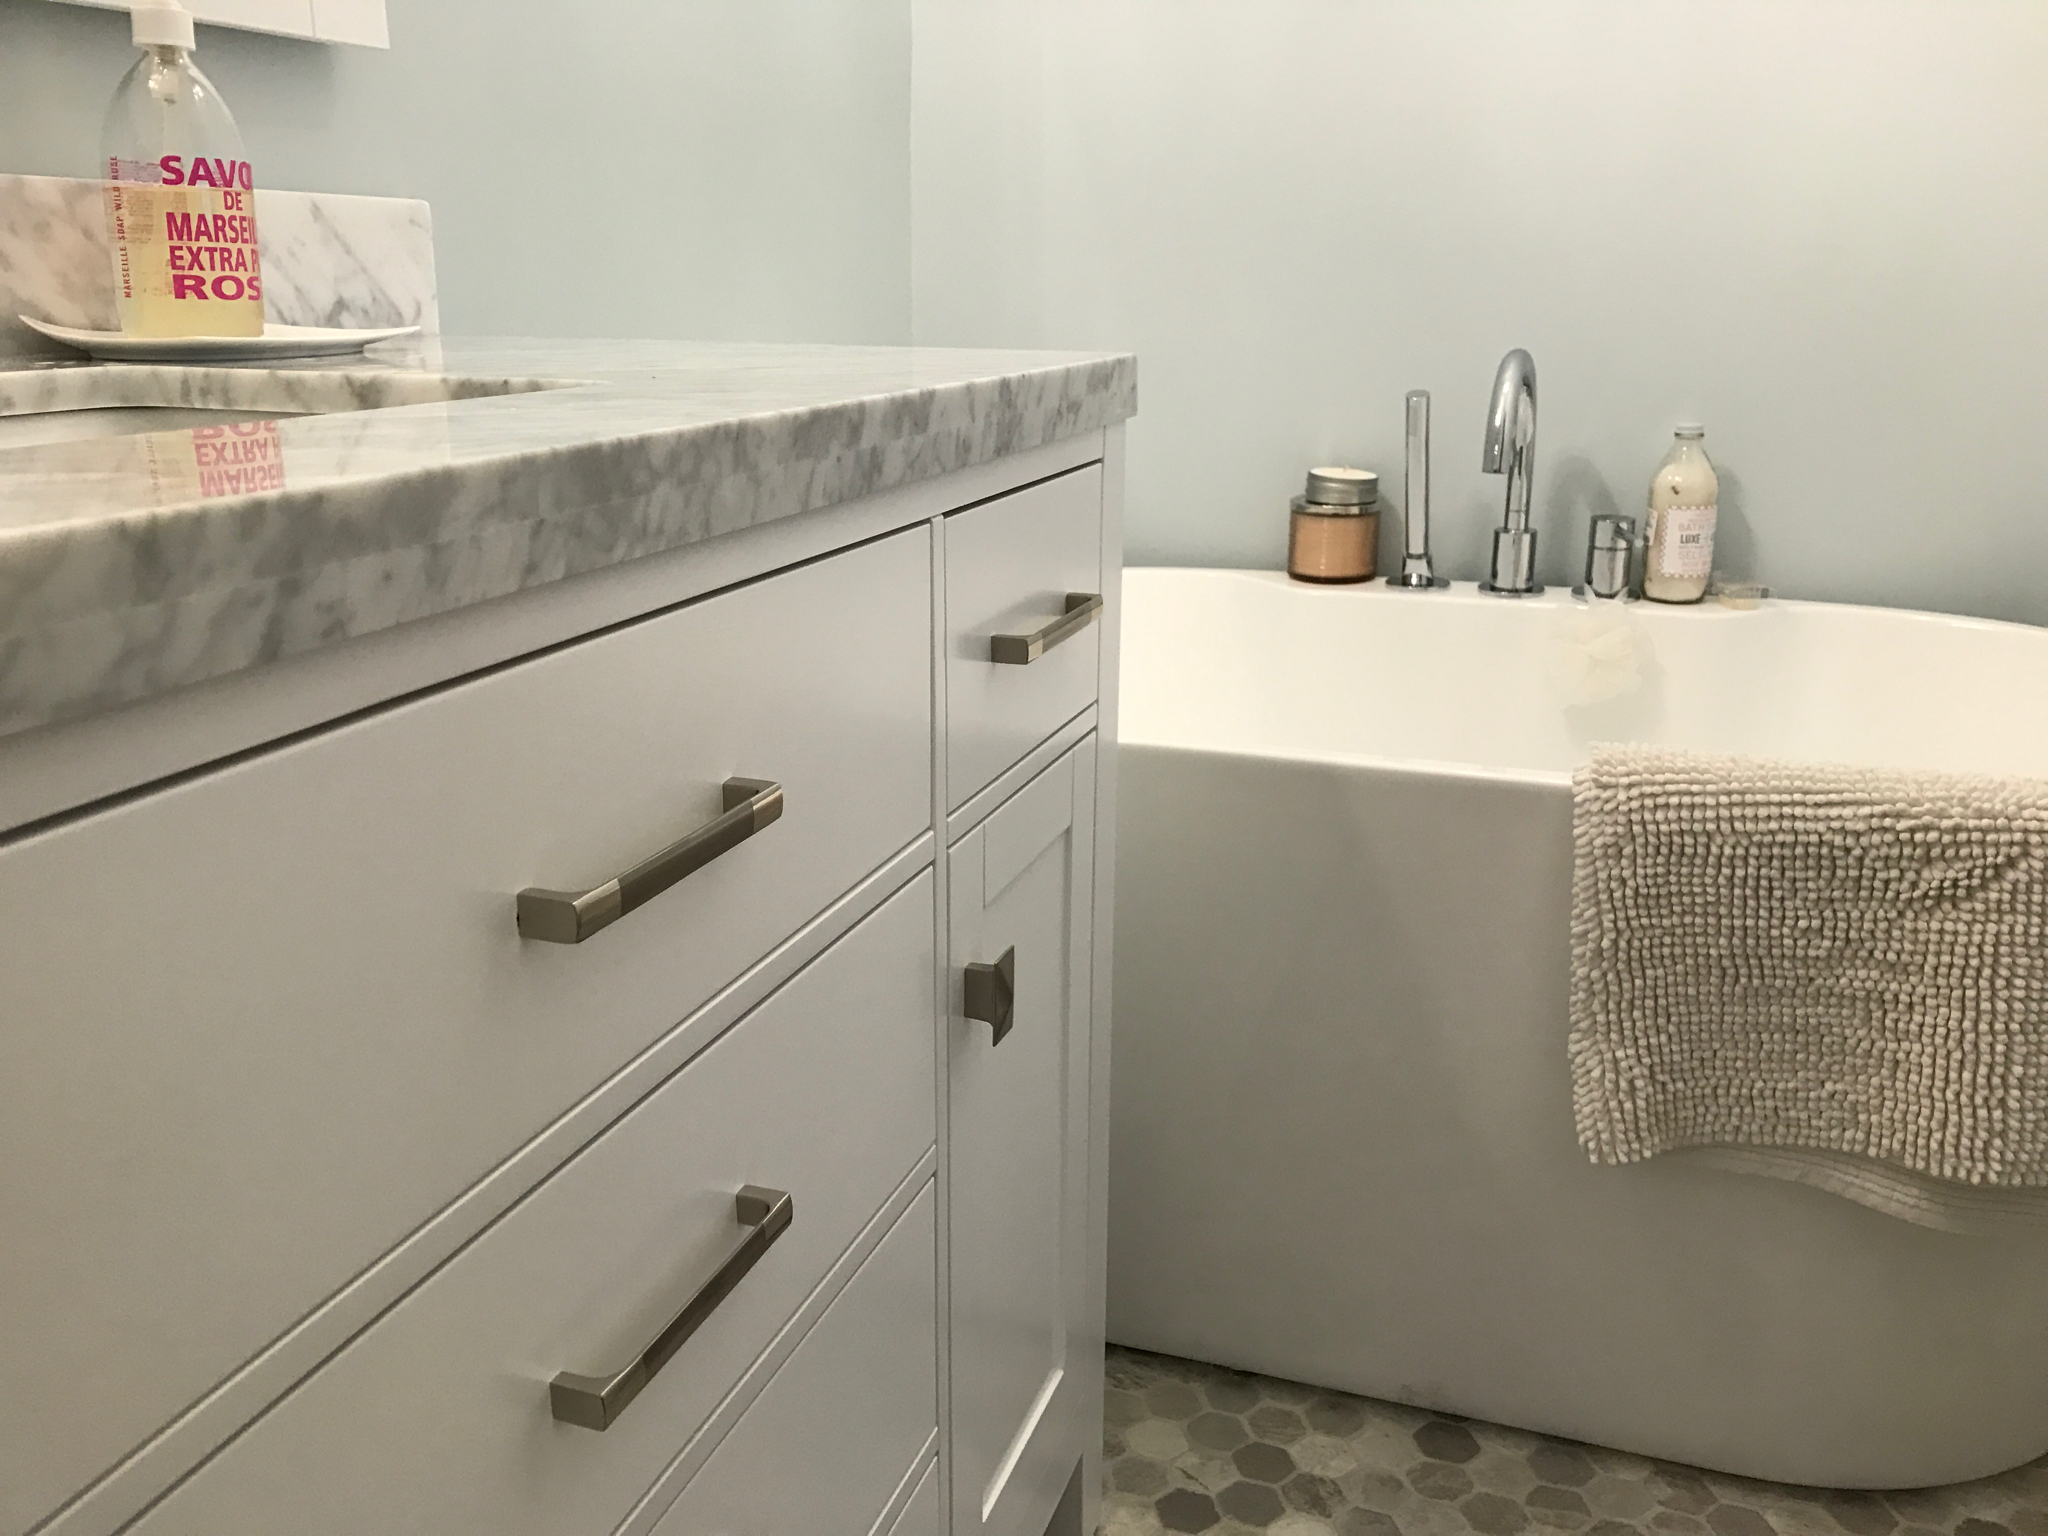 Kerr Residence- Simple and Elegant Bathroom Upgrade